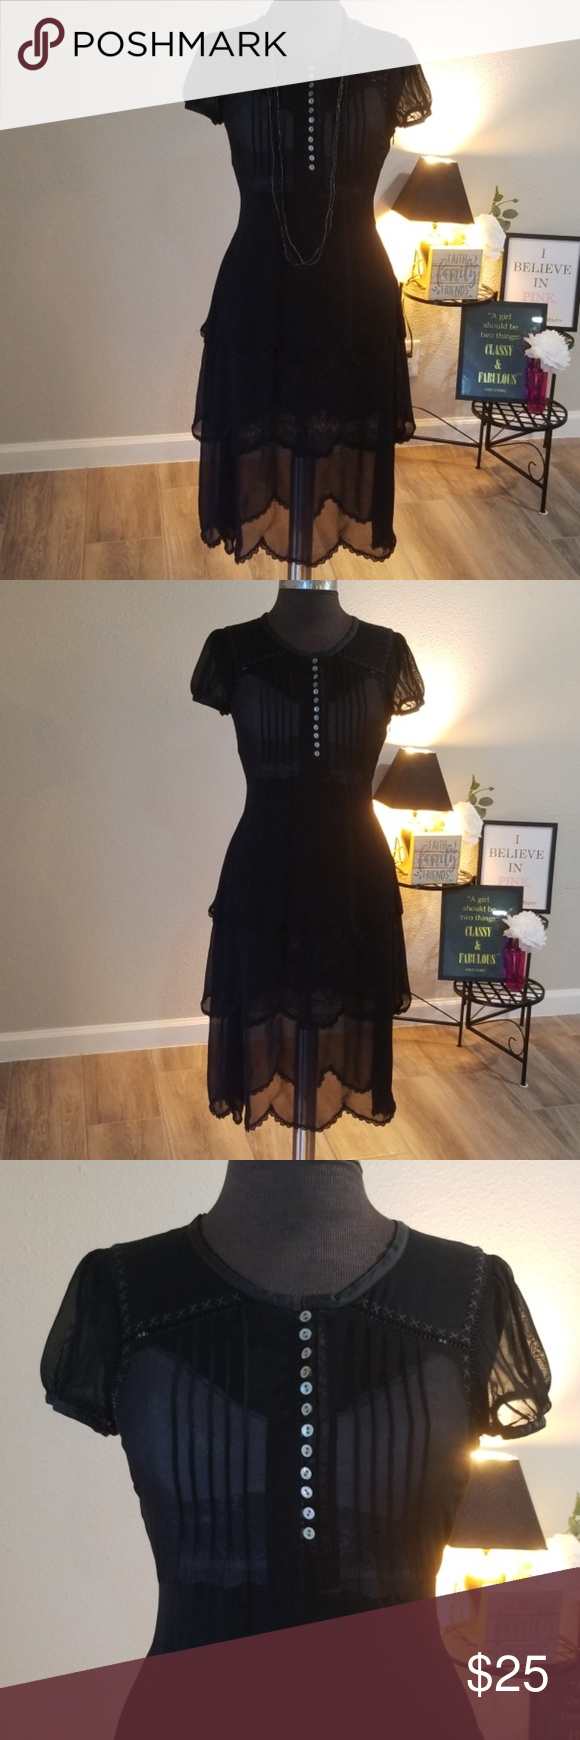 Anthropologie Maeve Babydoll Sheer Dress Sheer Dress Nice Black Dress Clothes Design [ 1740 x 580 Pixel ]